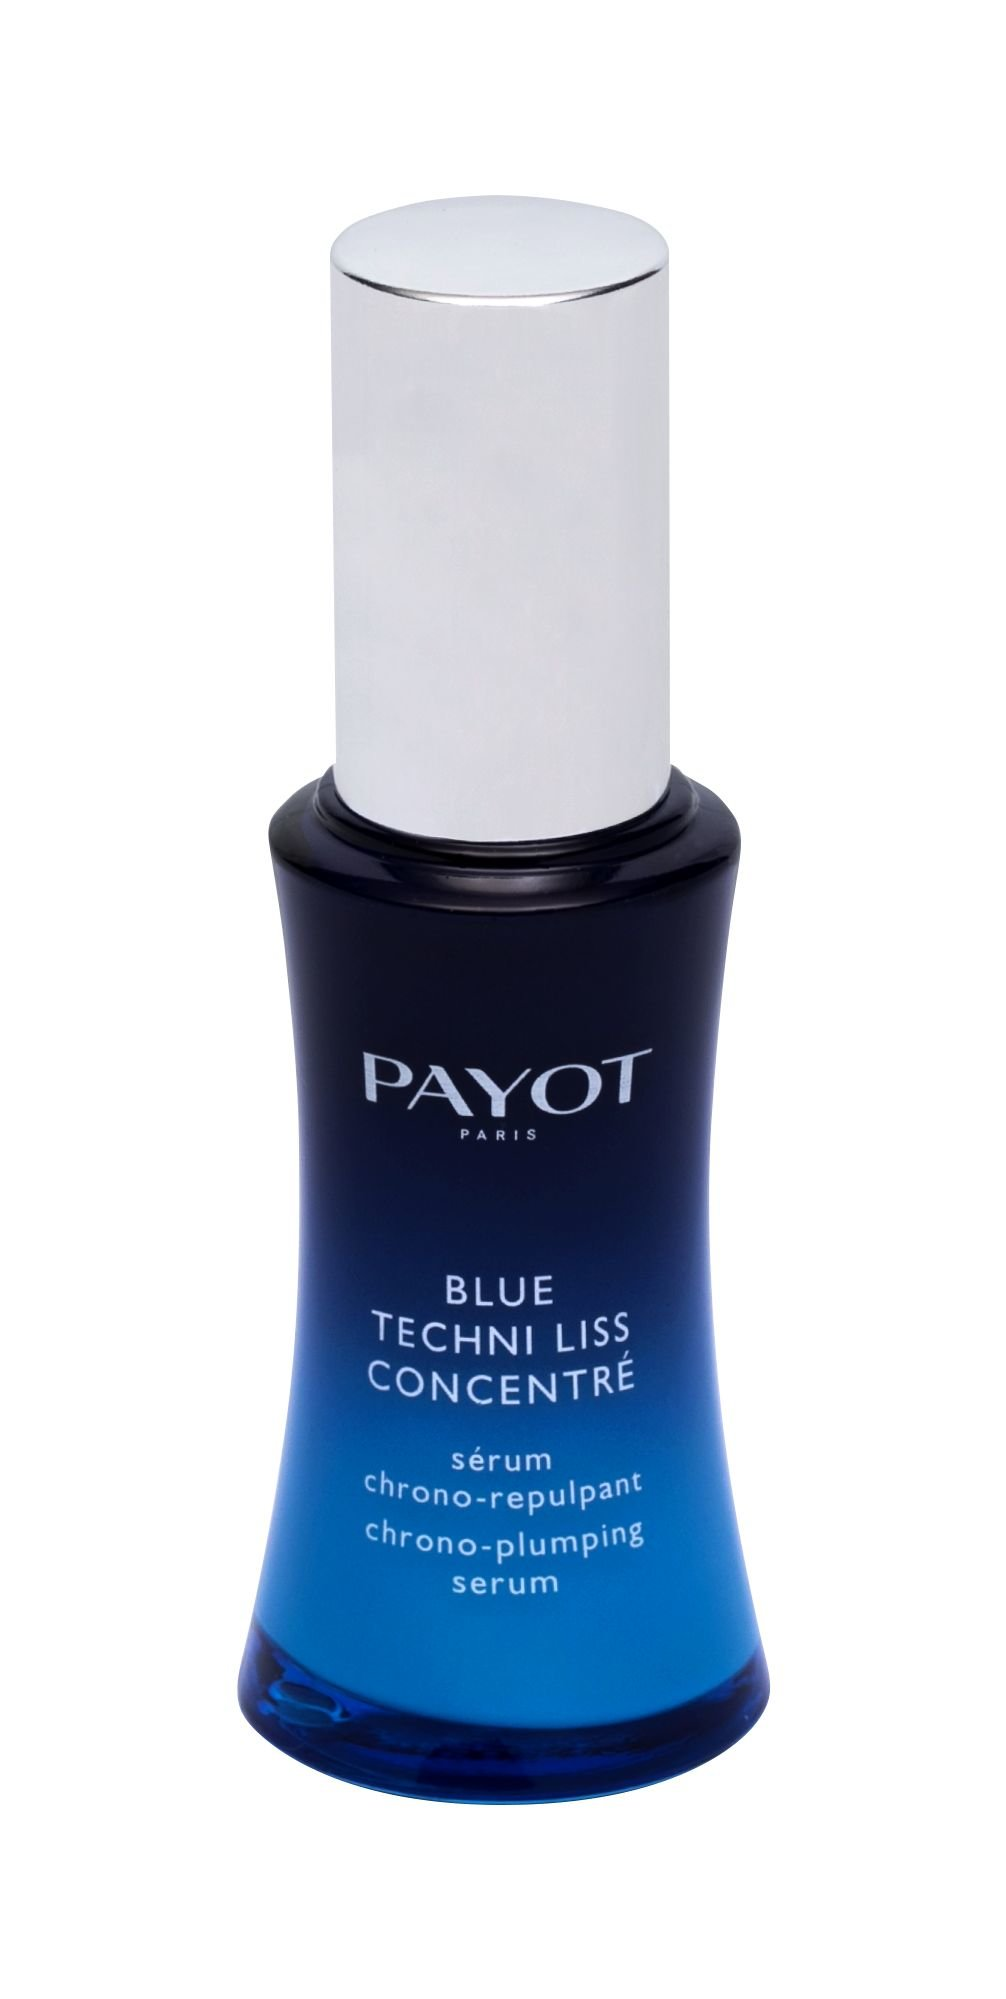 PAYOT Blue Techni Liss Skin Serum 30ml